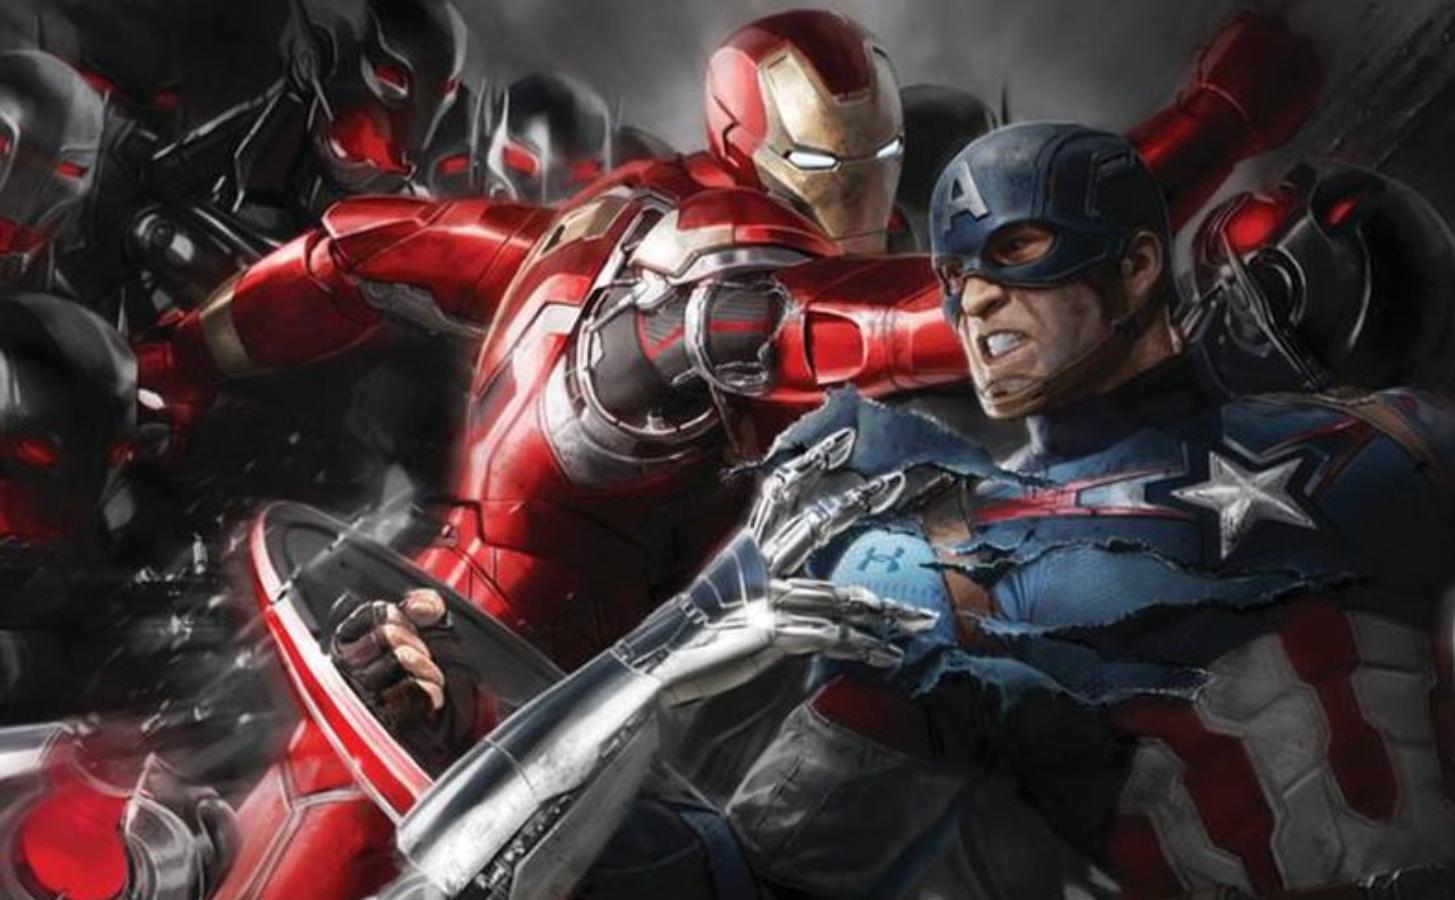 Revelado el final alterno de Avengers: Age of Ultron